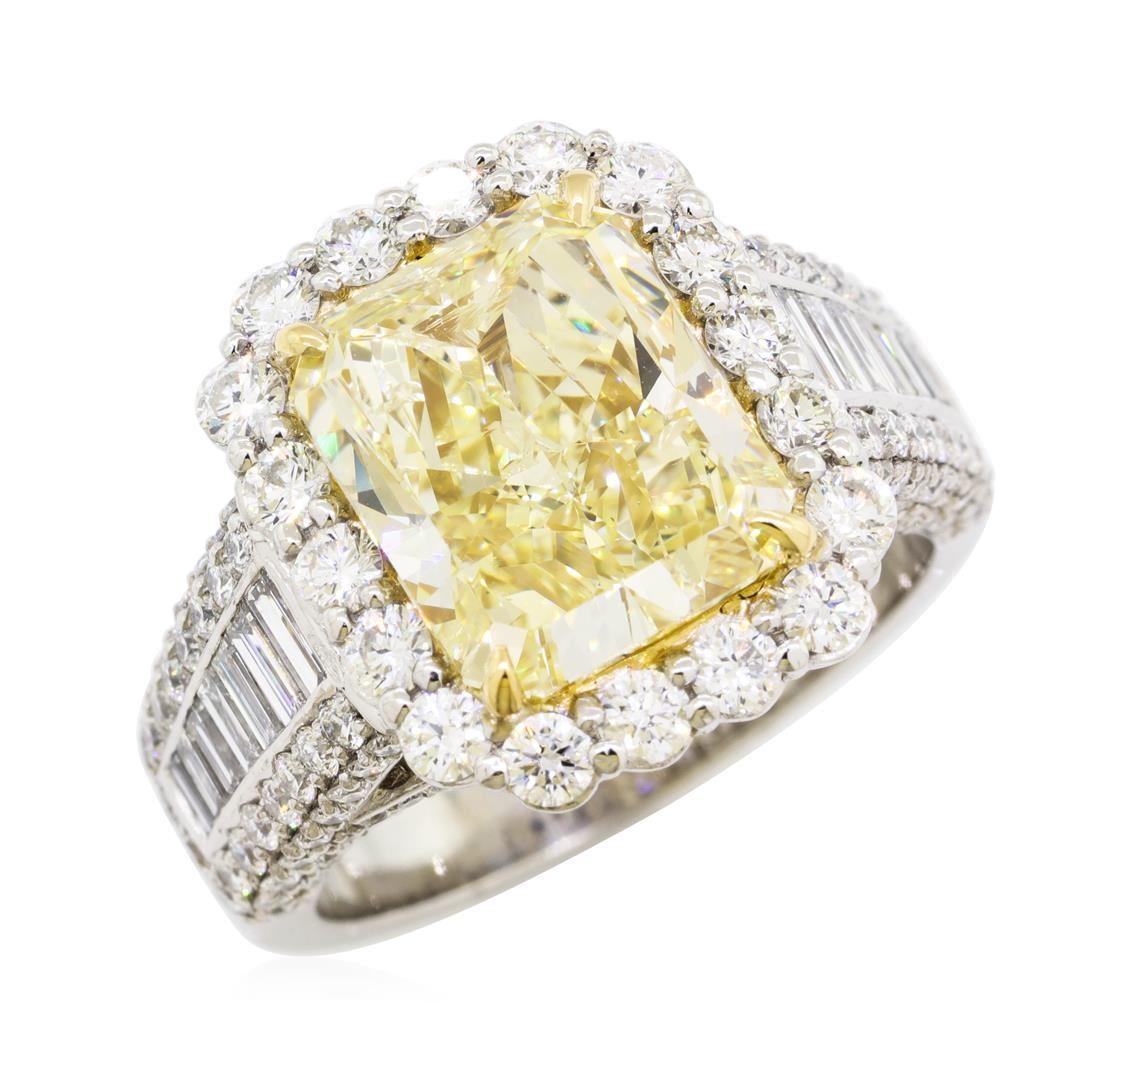 108f72fcd ... Image 5 : 5.02 ctw Center Fancy Yellow Diamond Ring - Platinum ...